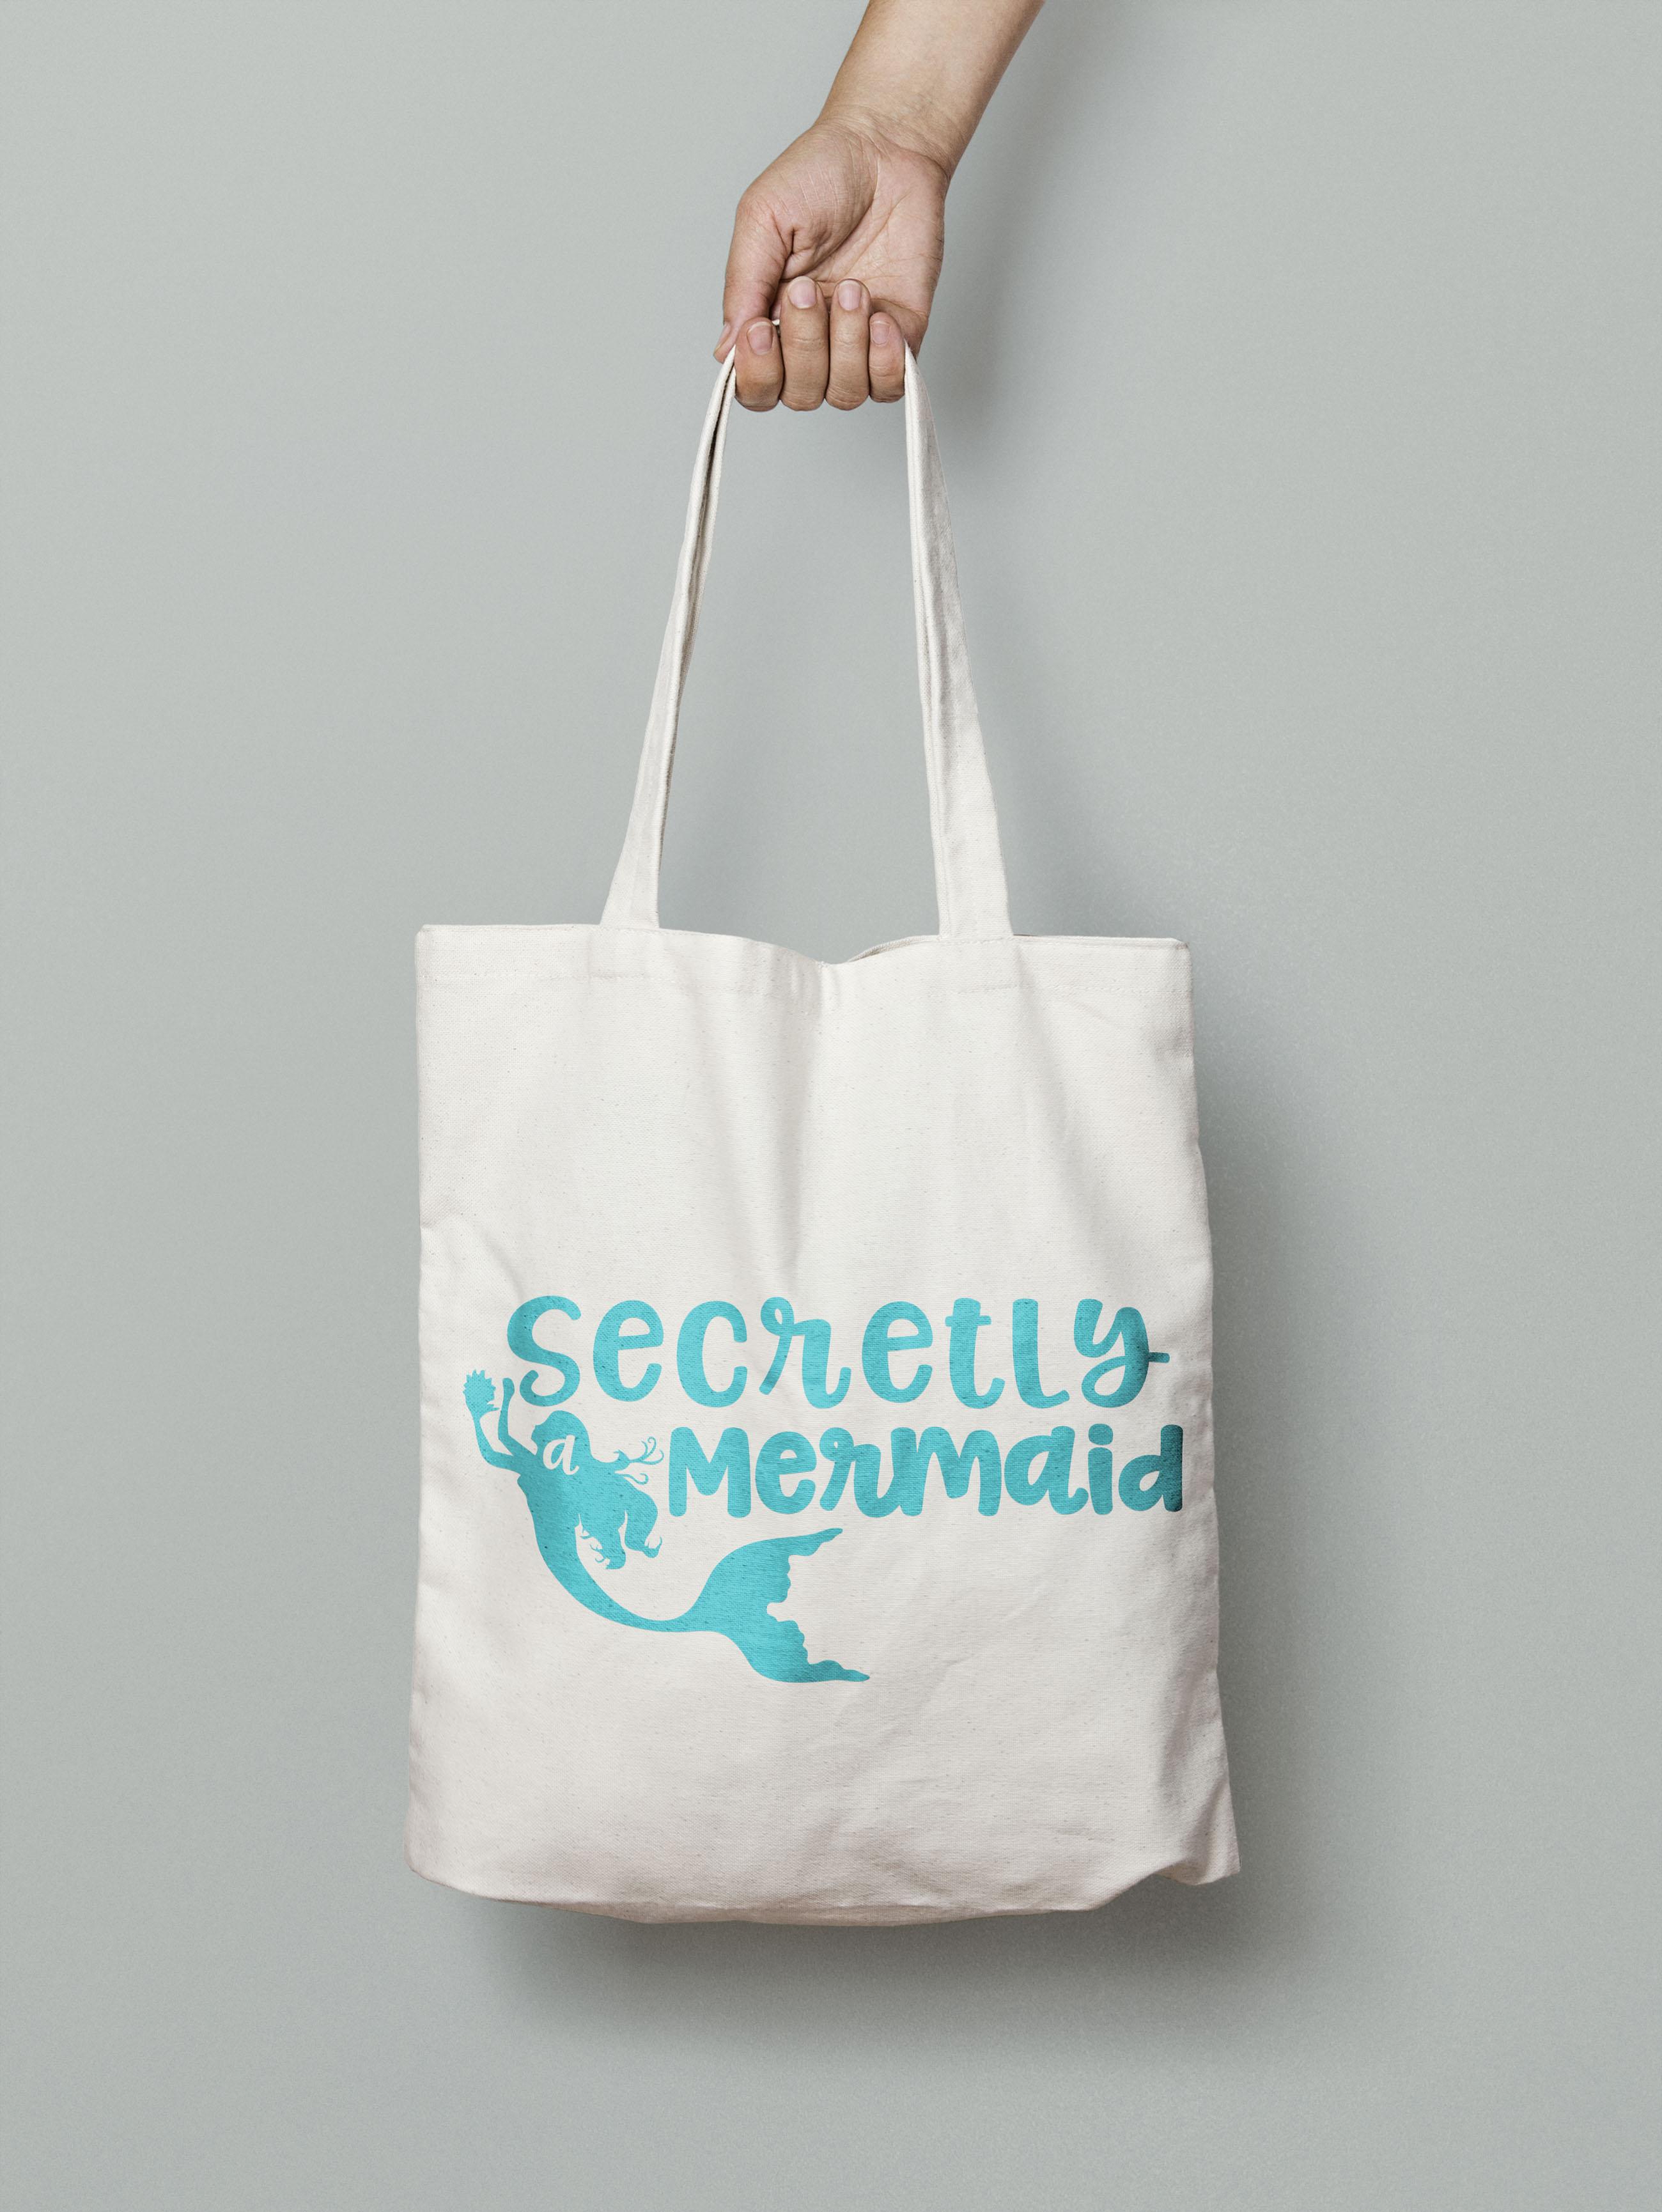 Secretly a Mermaid svg digital cut file Mermaid Love example image 3